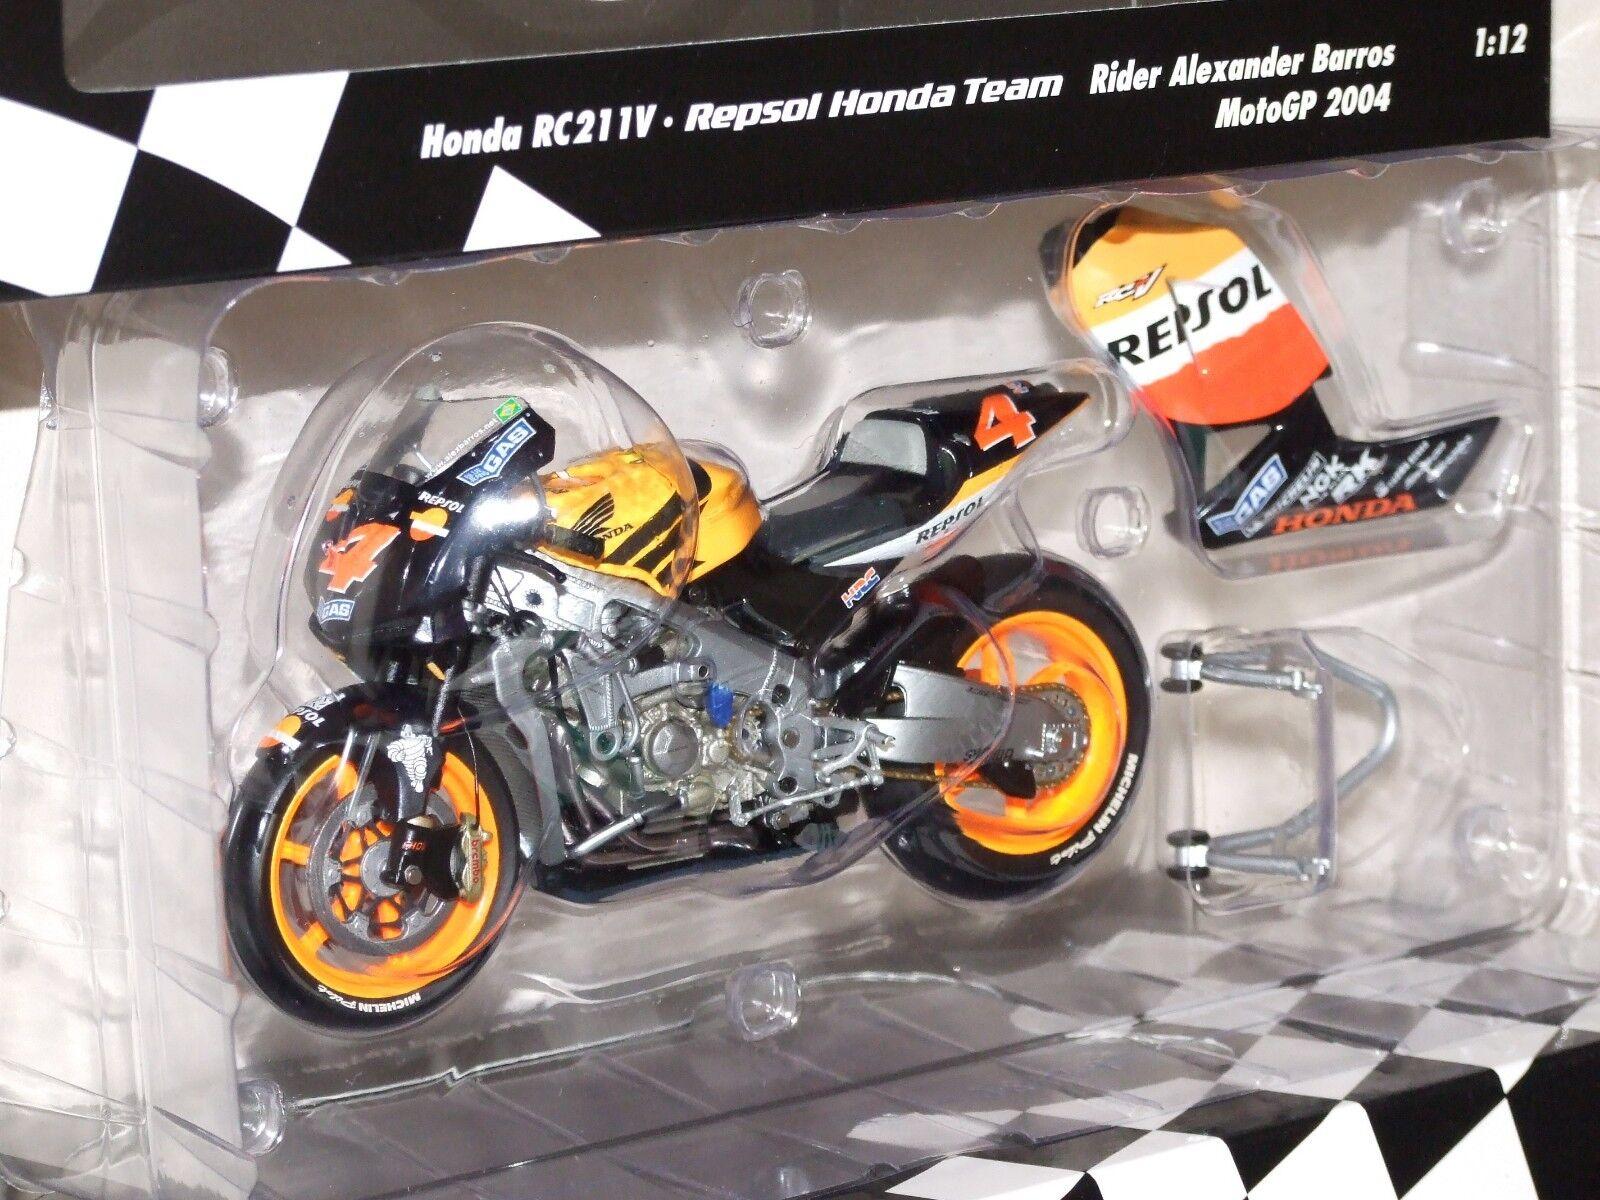 Minichamps 1 12 Repsol HONDA RC211V RC211V RC211V Alexander Barros 2004 MotoGP 122041004 458329